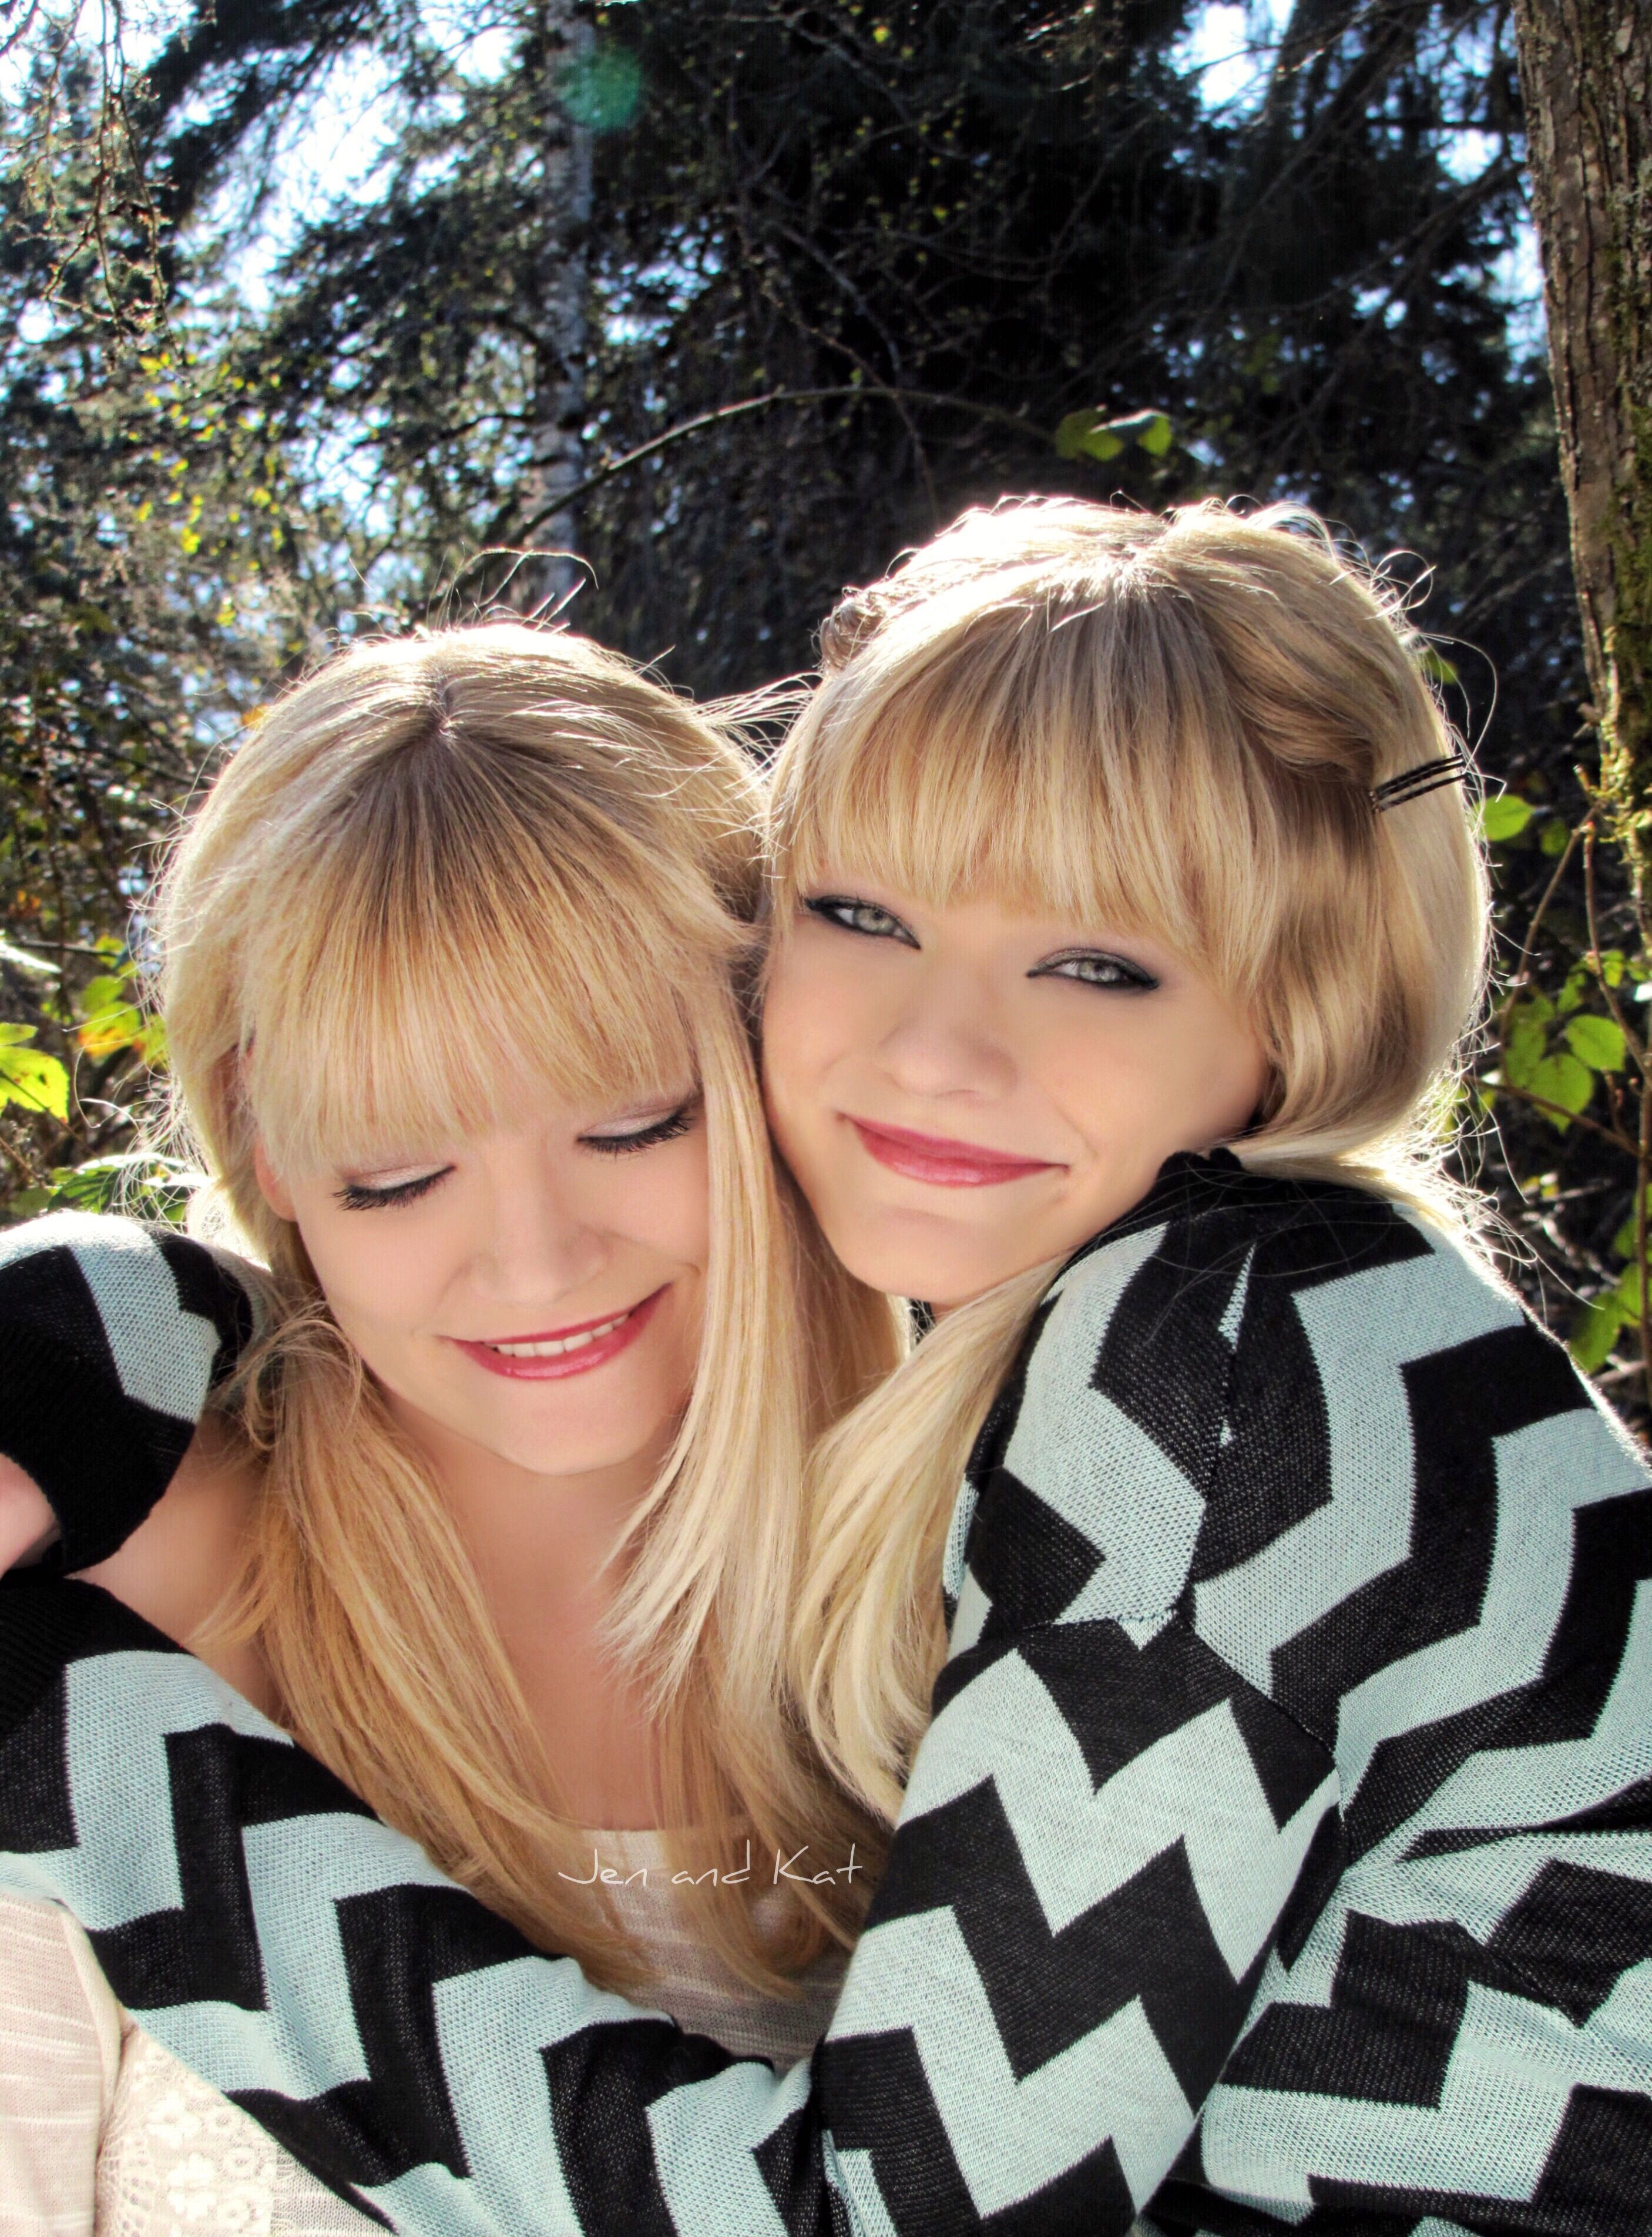 Jen and Kat